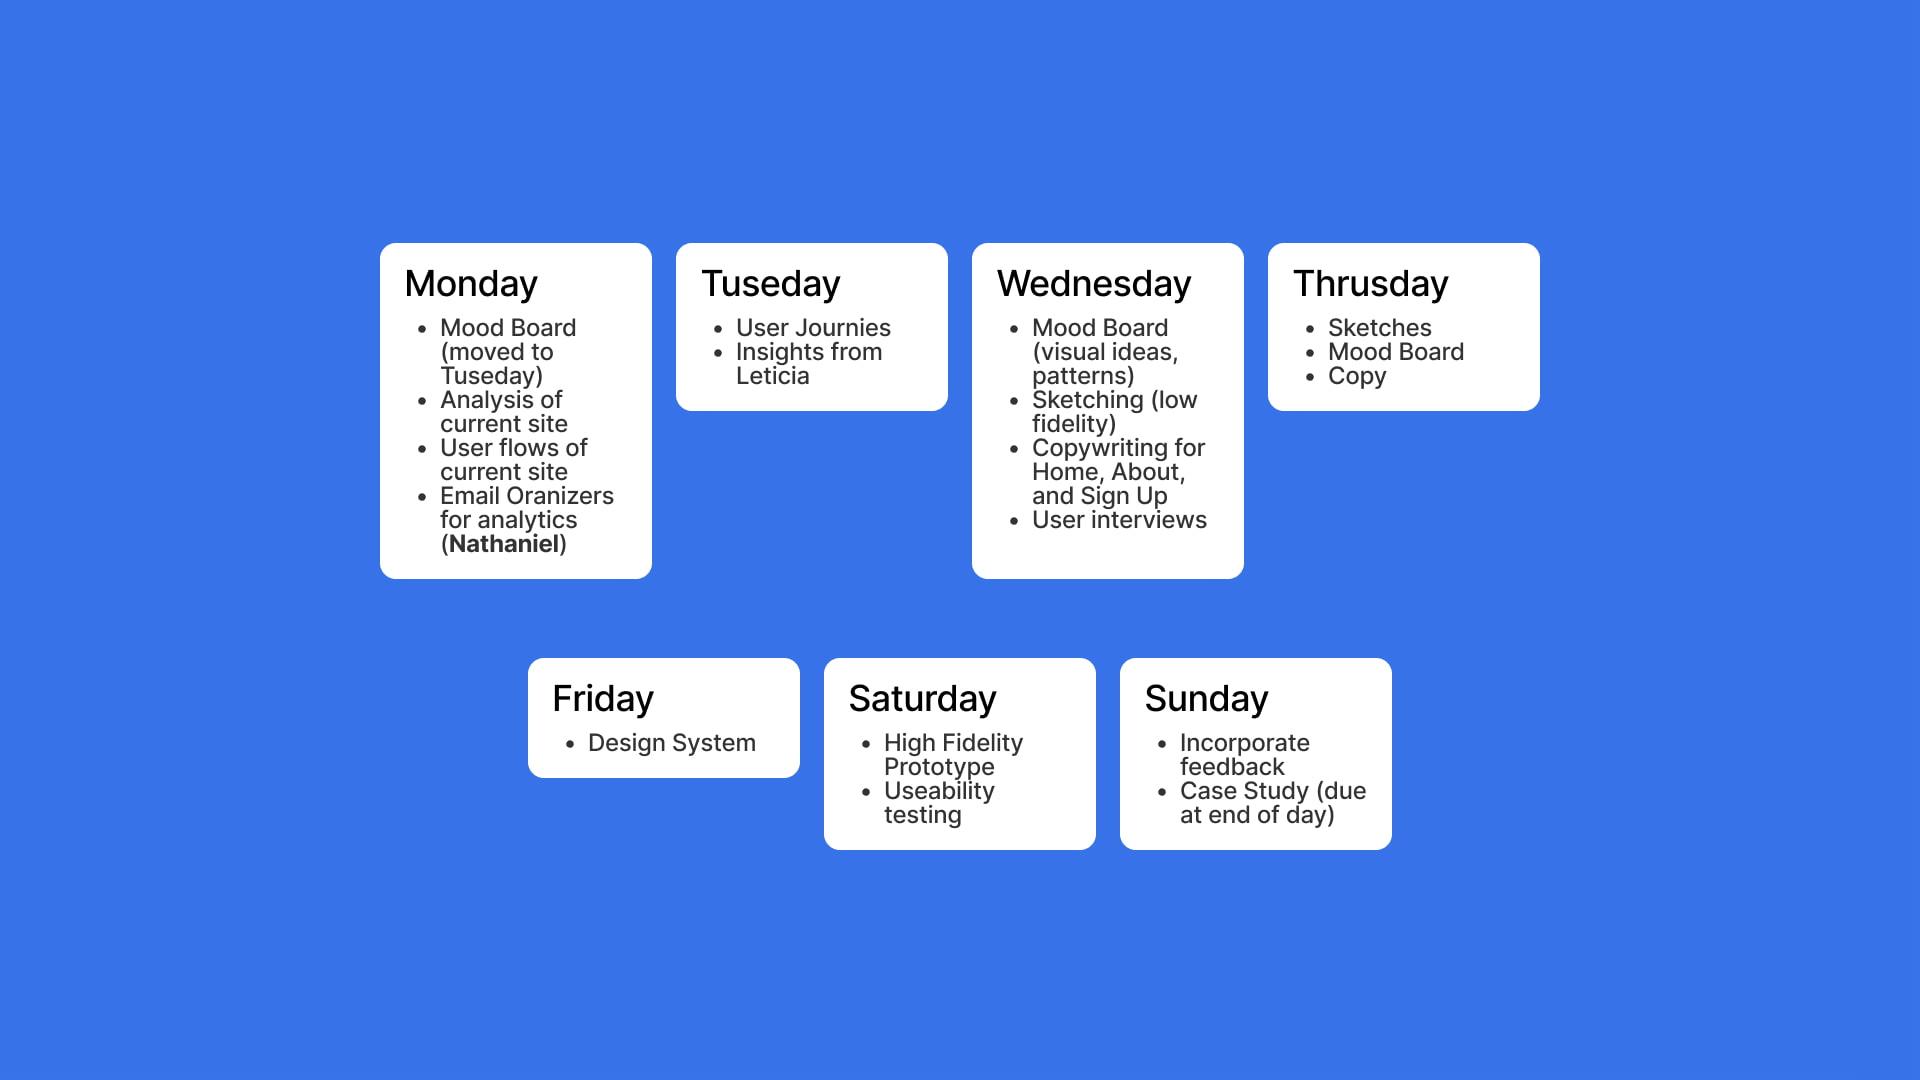 Rough week-long schedule for design task